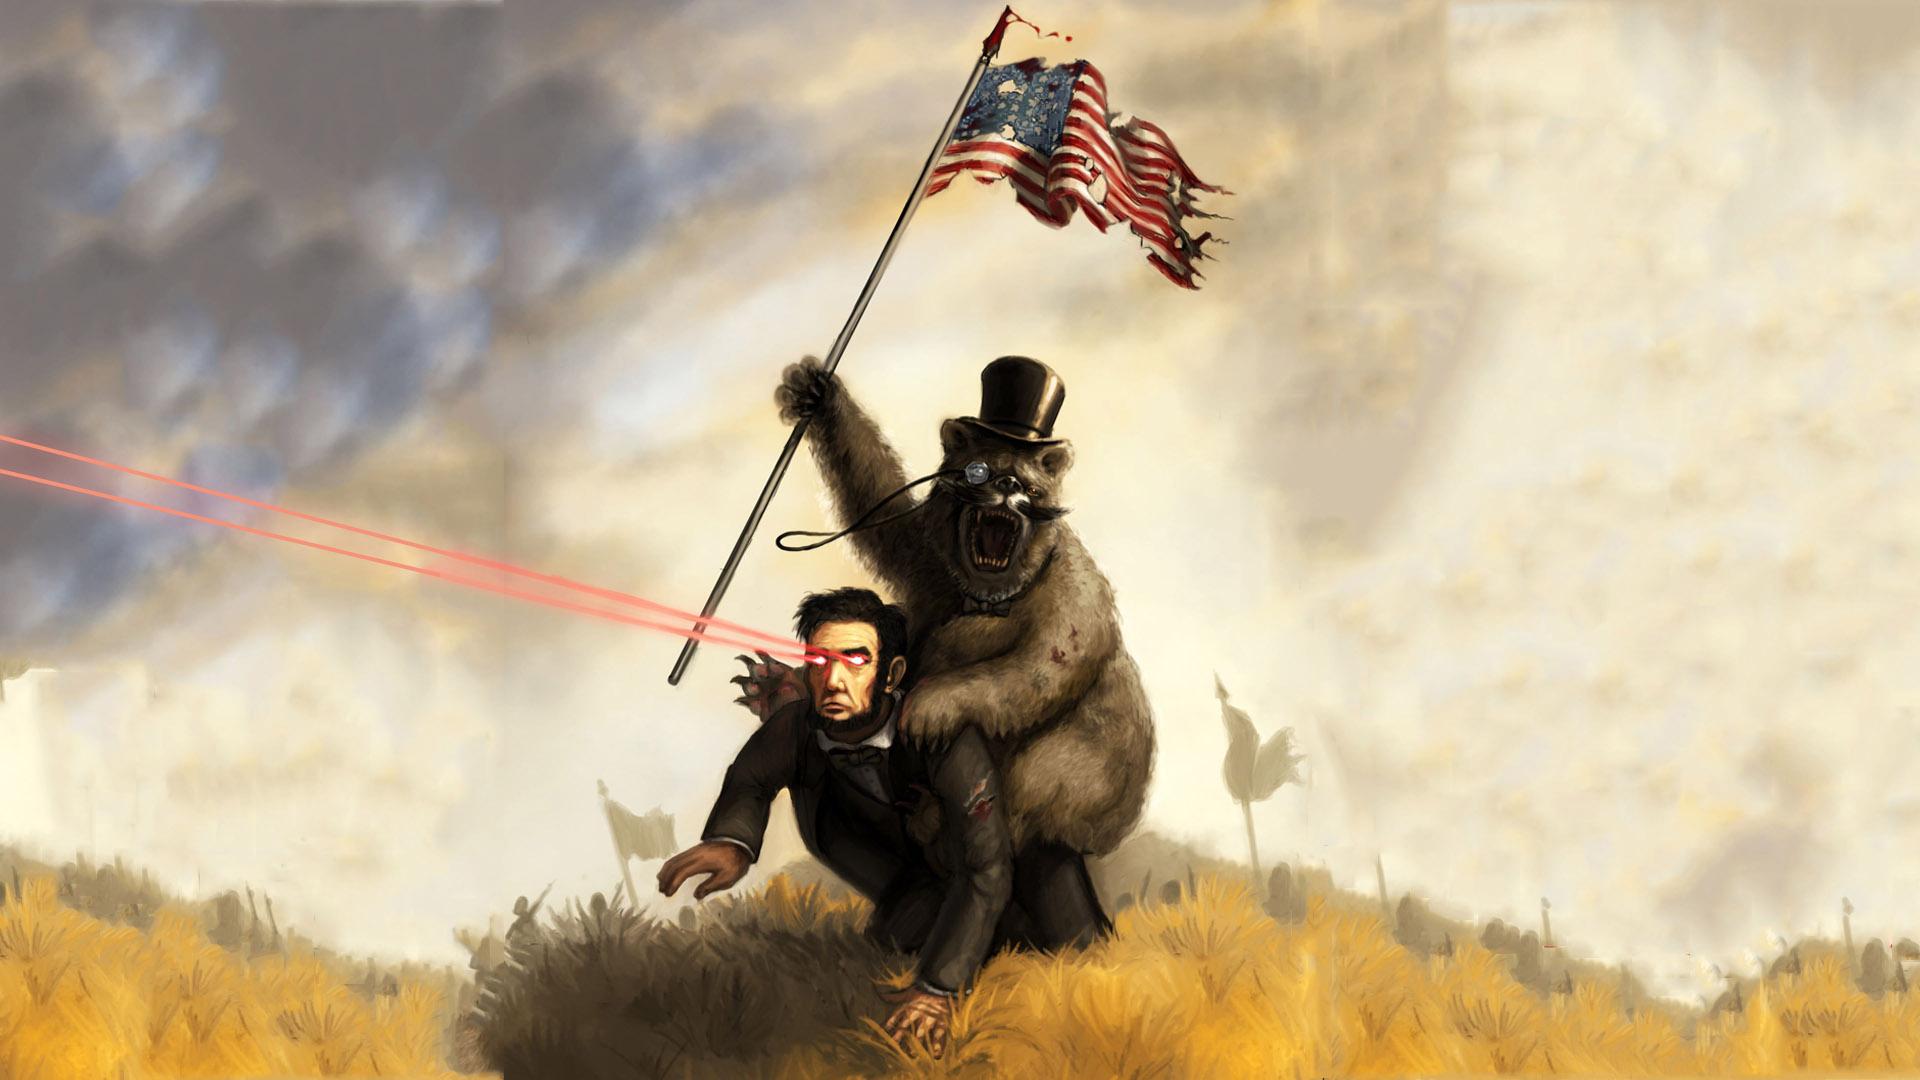 Abraham-Lincoln-funny-flags-bears.jpg